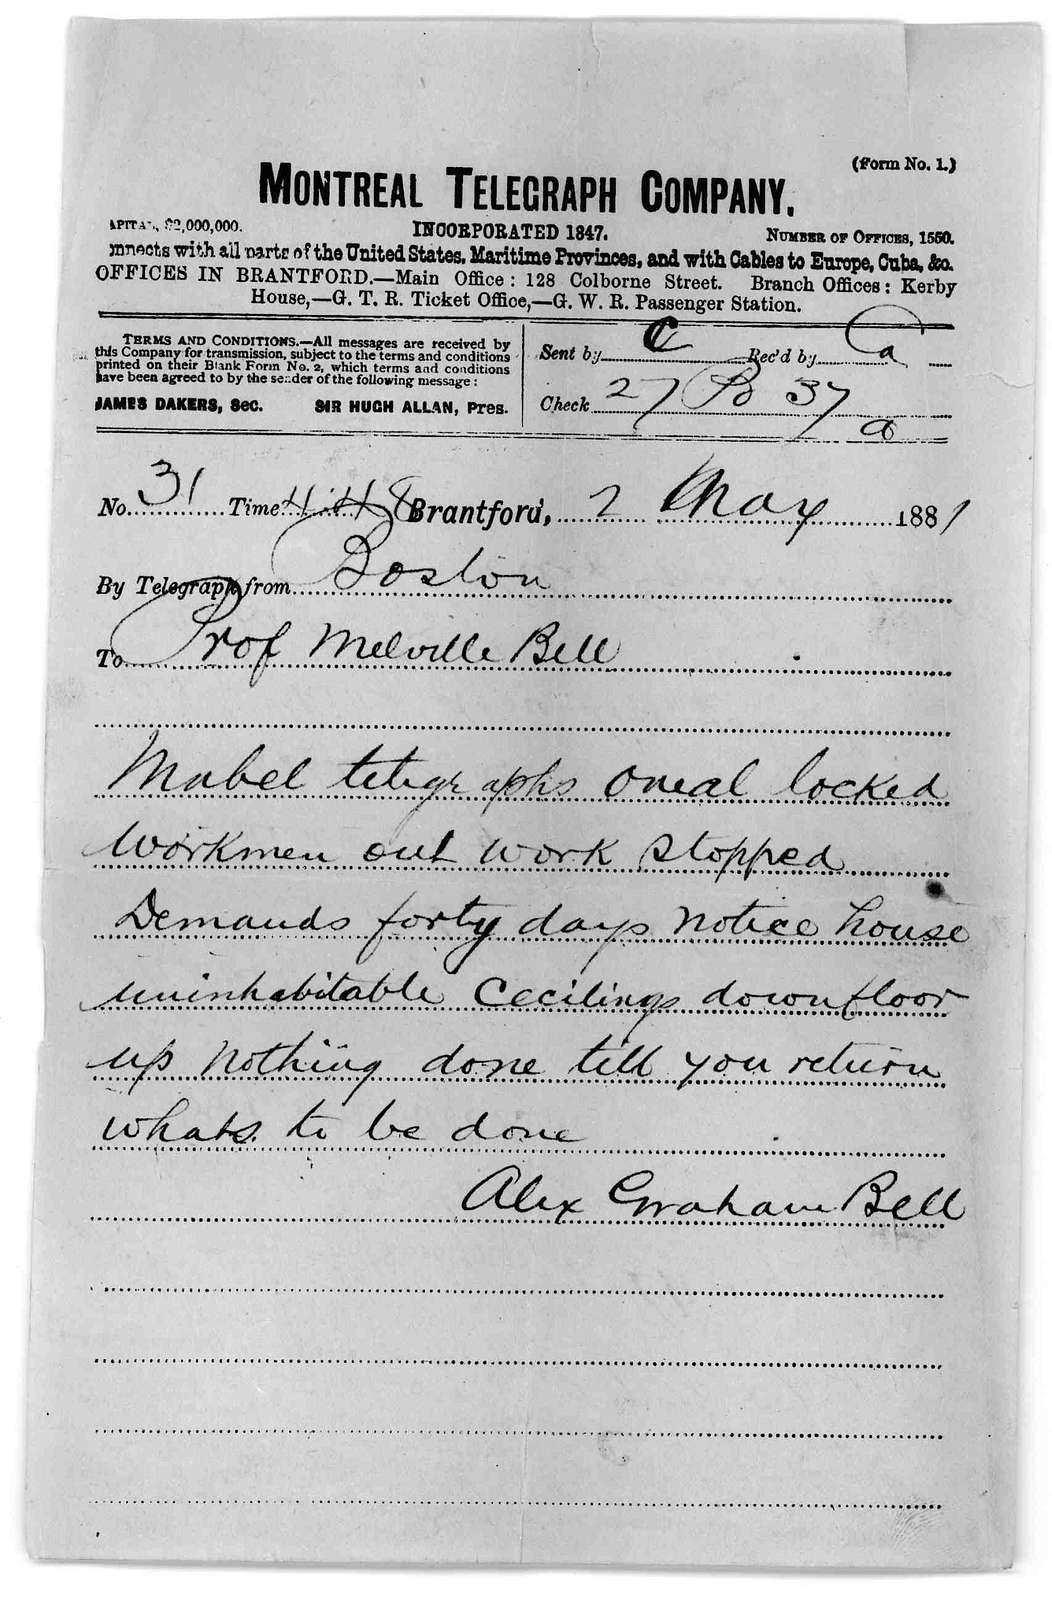 Telegram from Alexander Graham Bell to Alexander Melville Bell, May 2, 1881